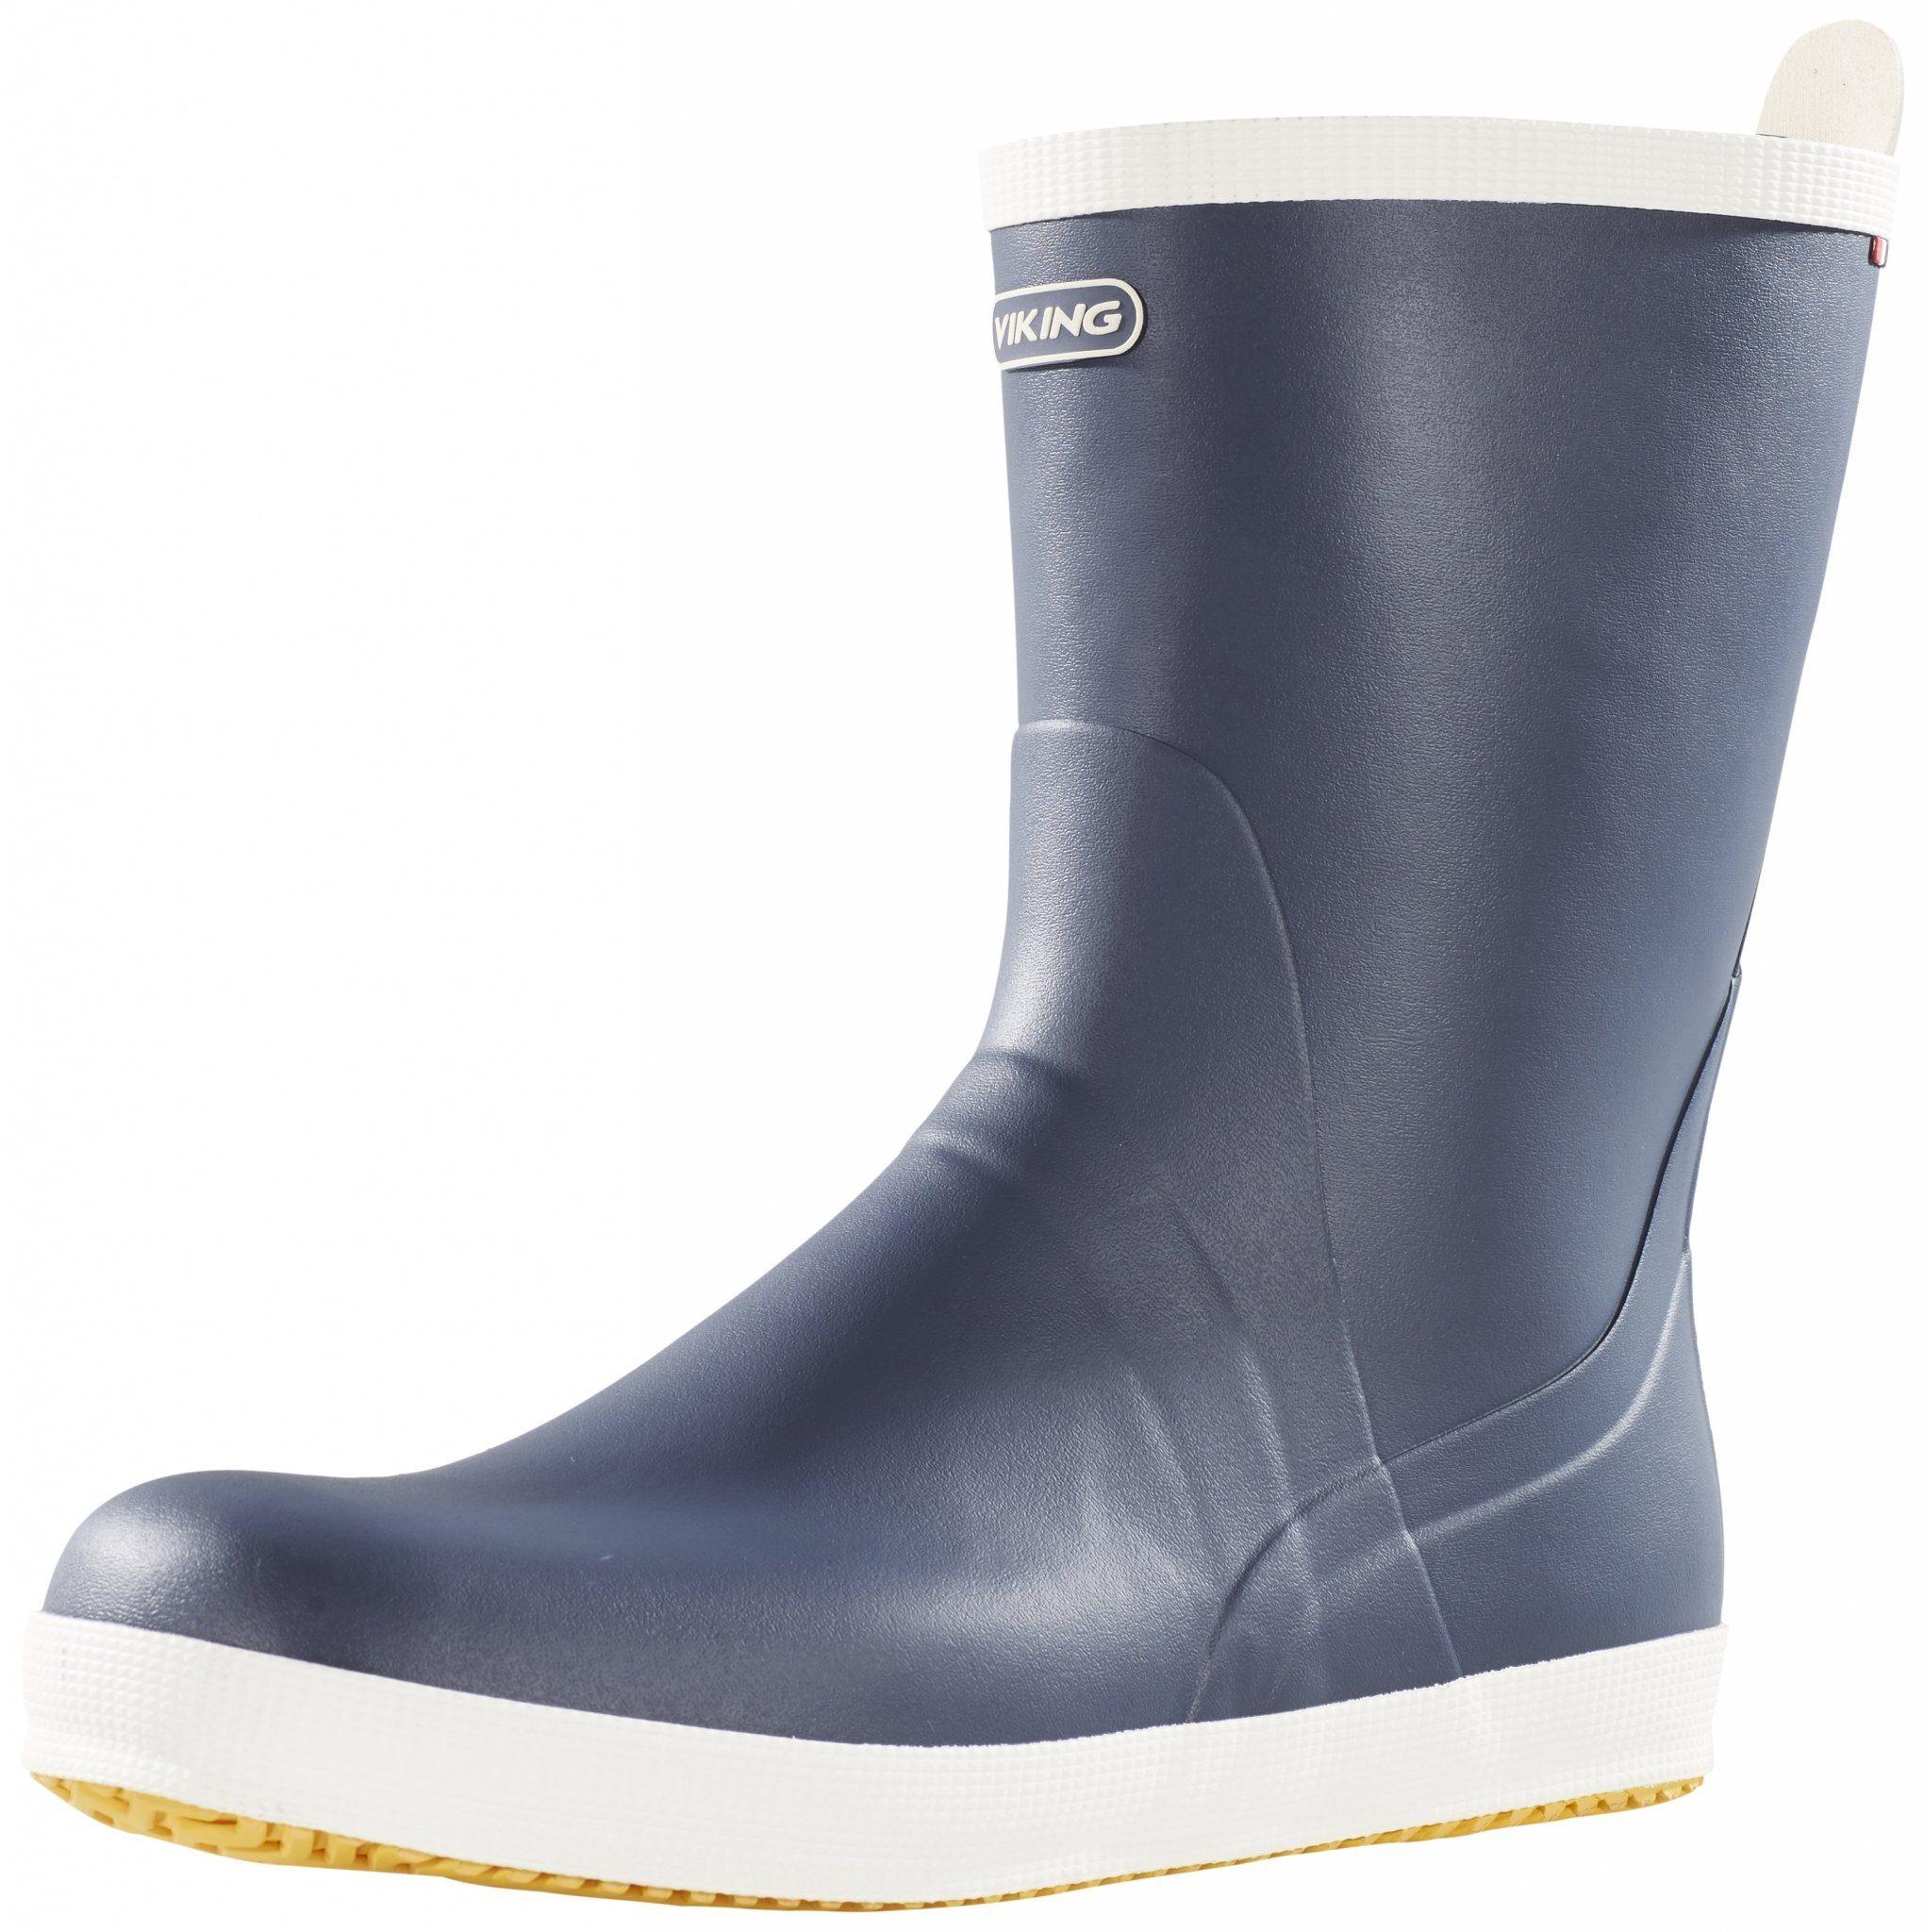 VIKING Trekkingschuh Viking Seilas Boots Unisex  blau